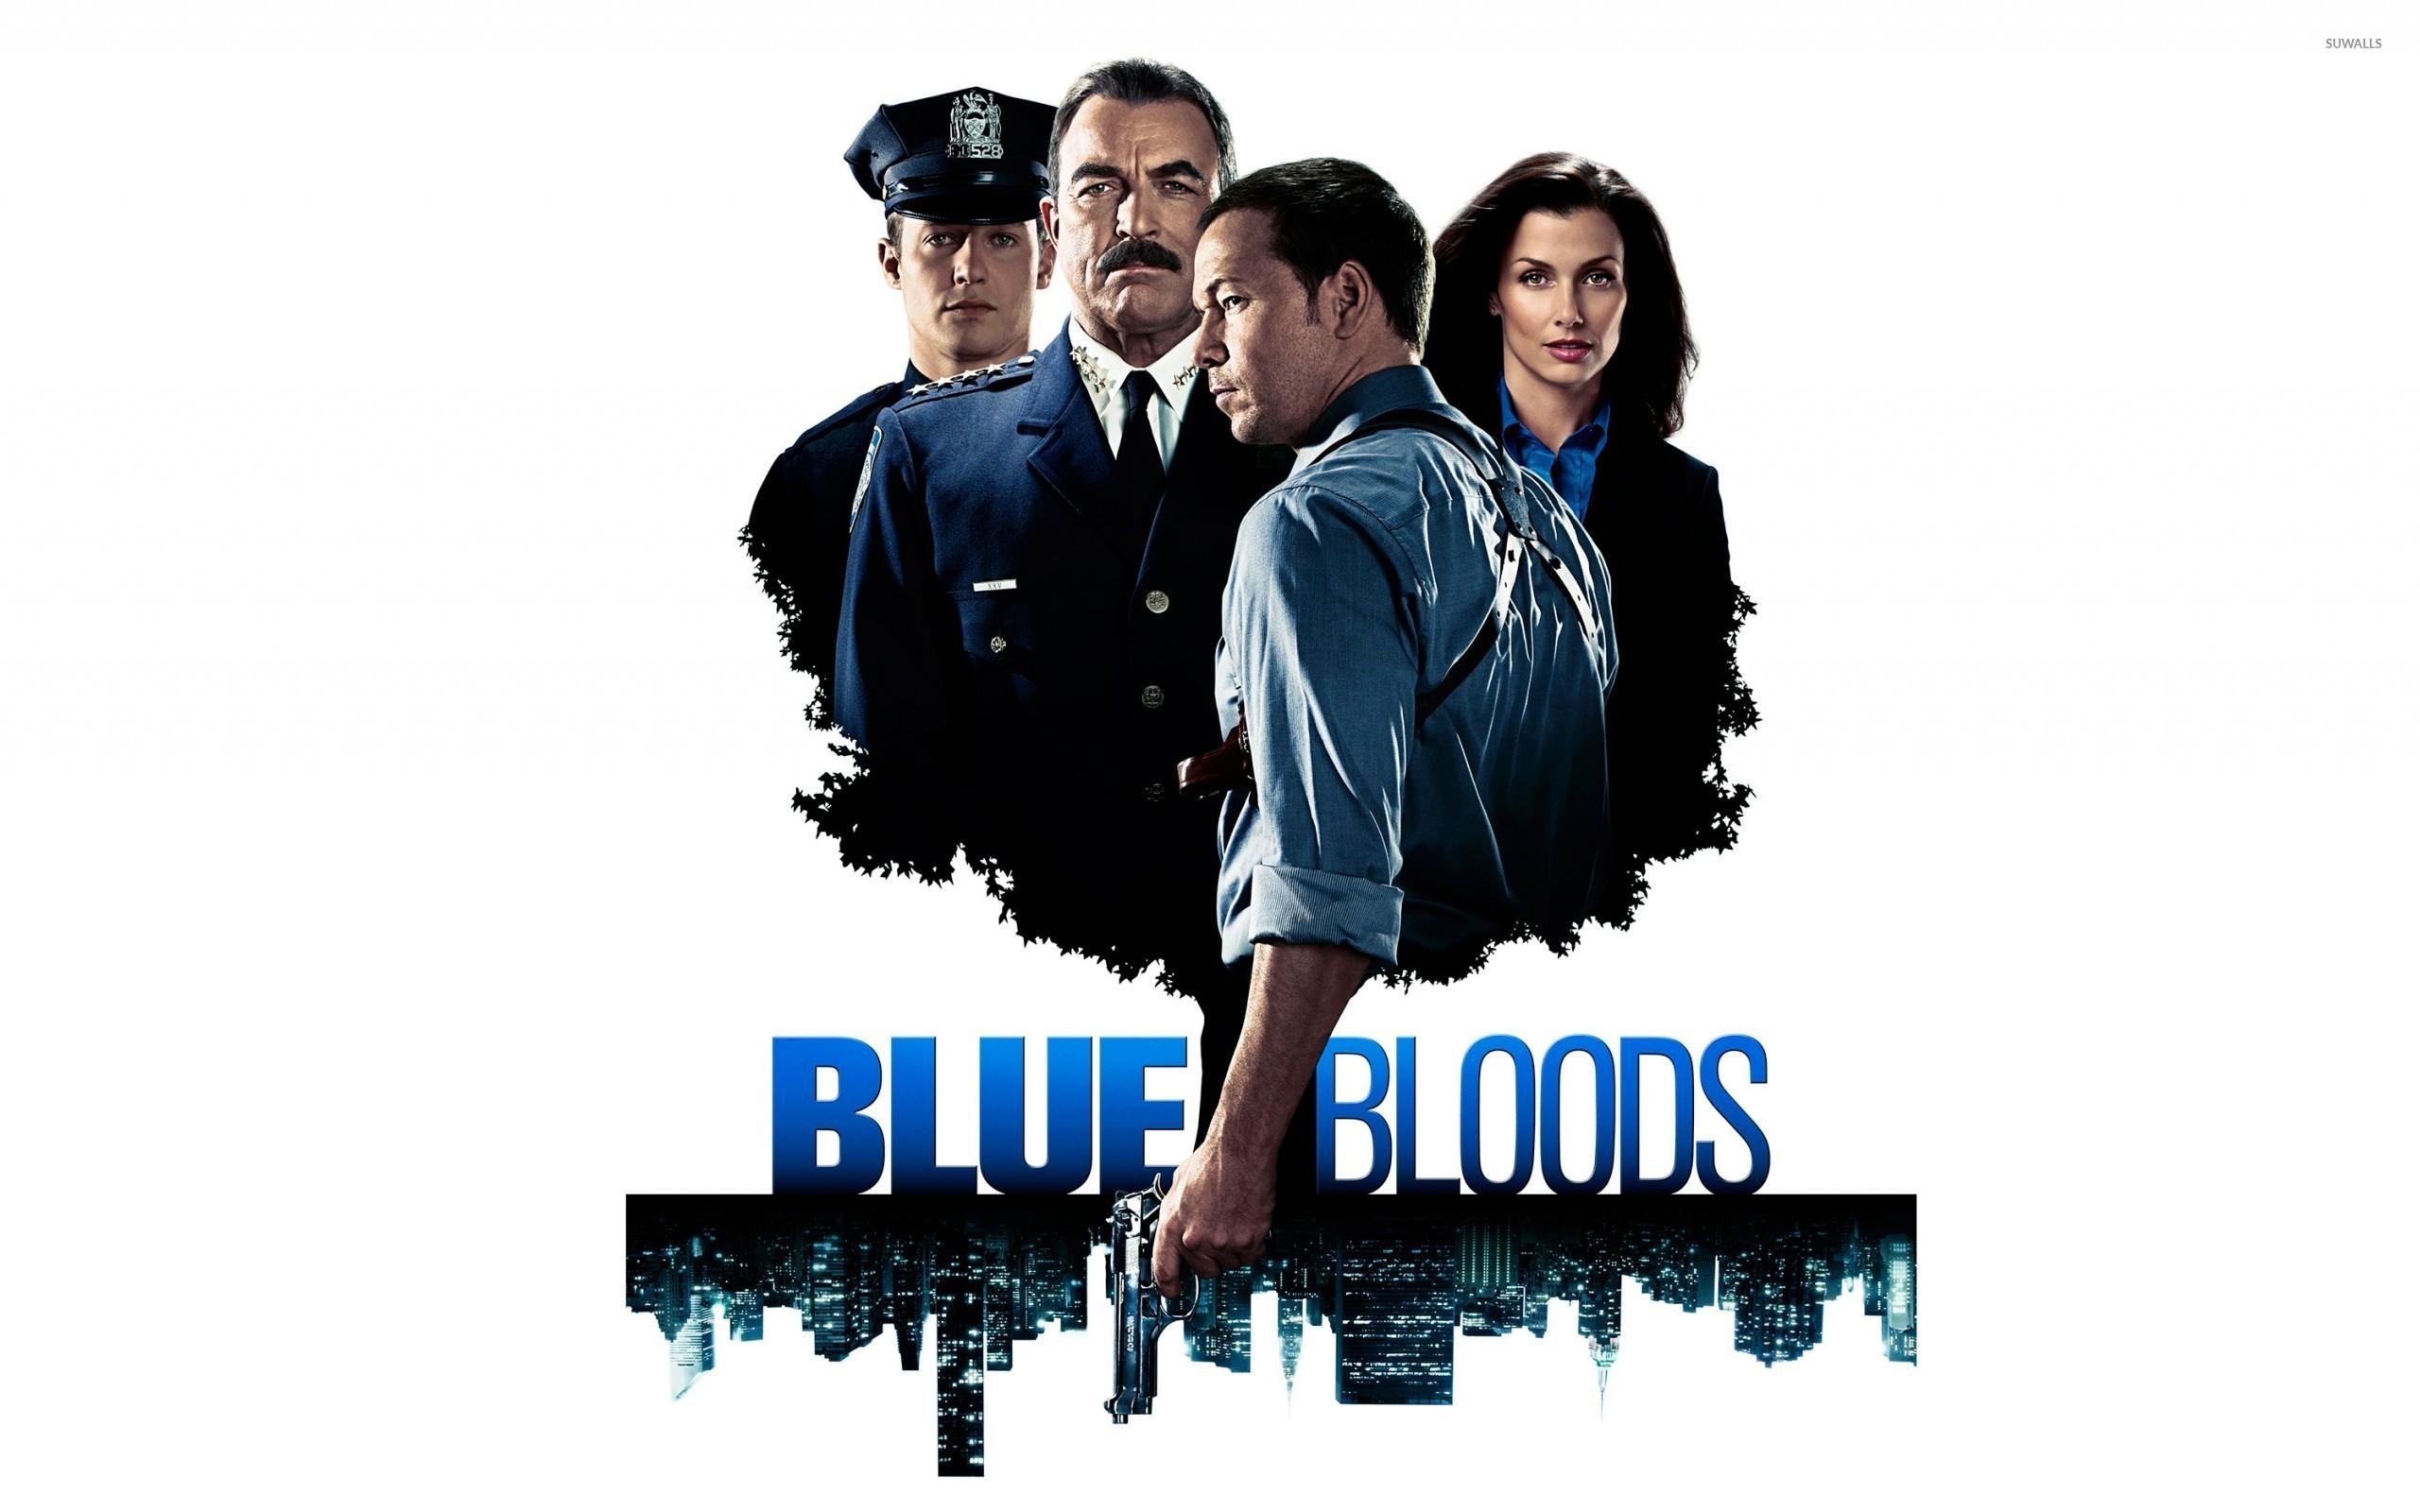 Game Of Thrones Quotes Desktop Wallpaper Blue Bloods Main Characters Wallpaper Tv Show Wallpapers